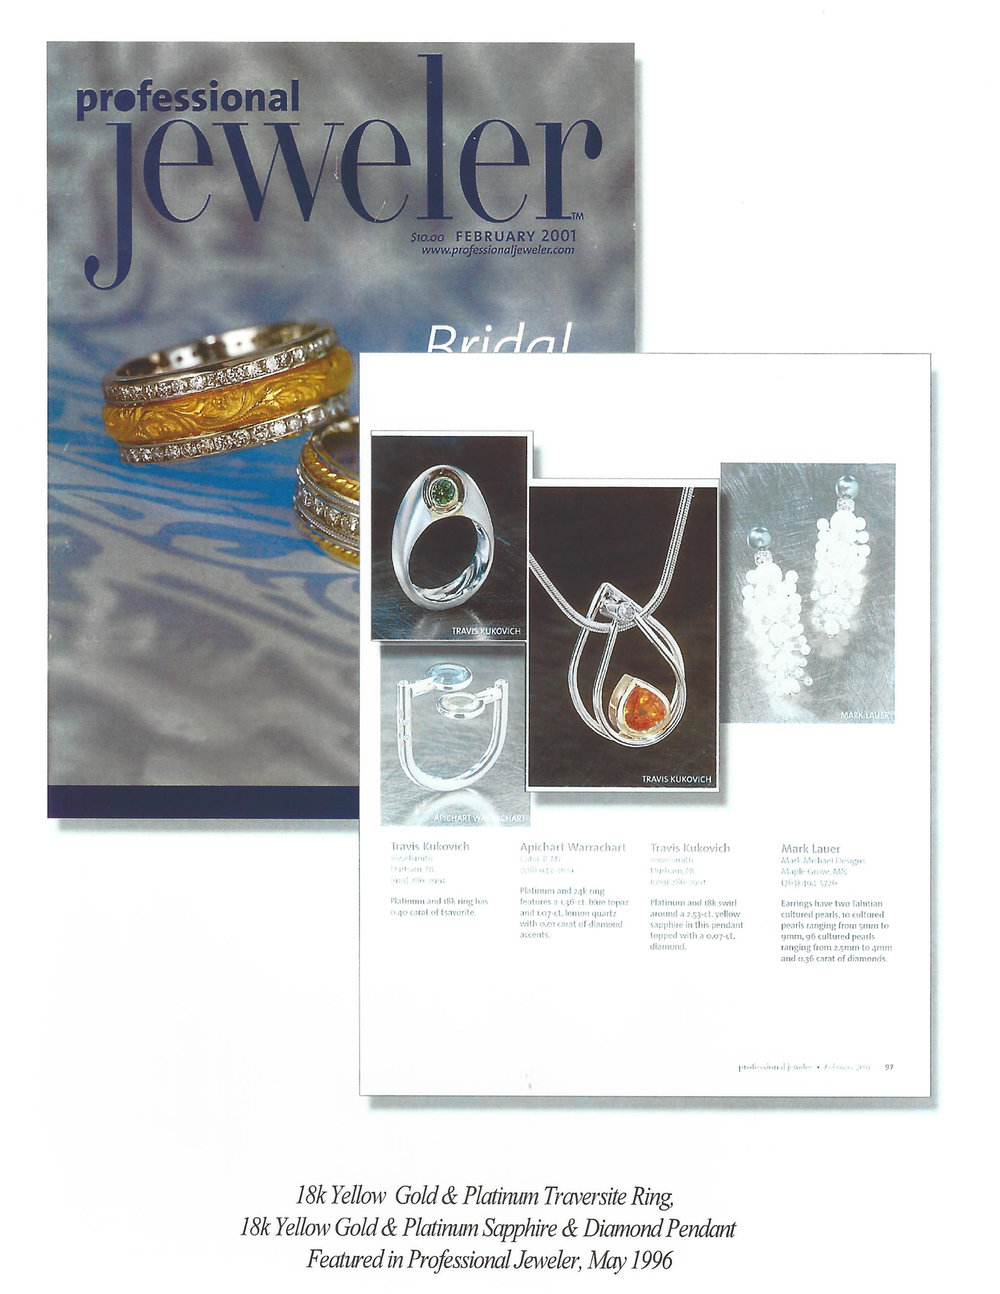 professional-jeweler-may-1996.jpg